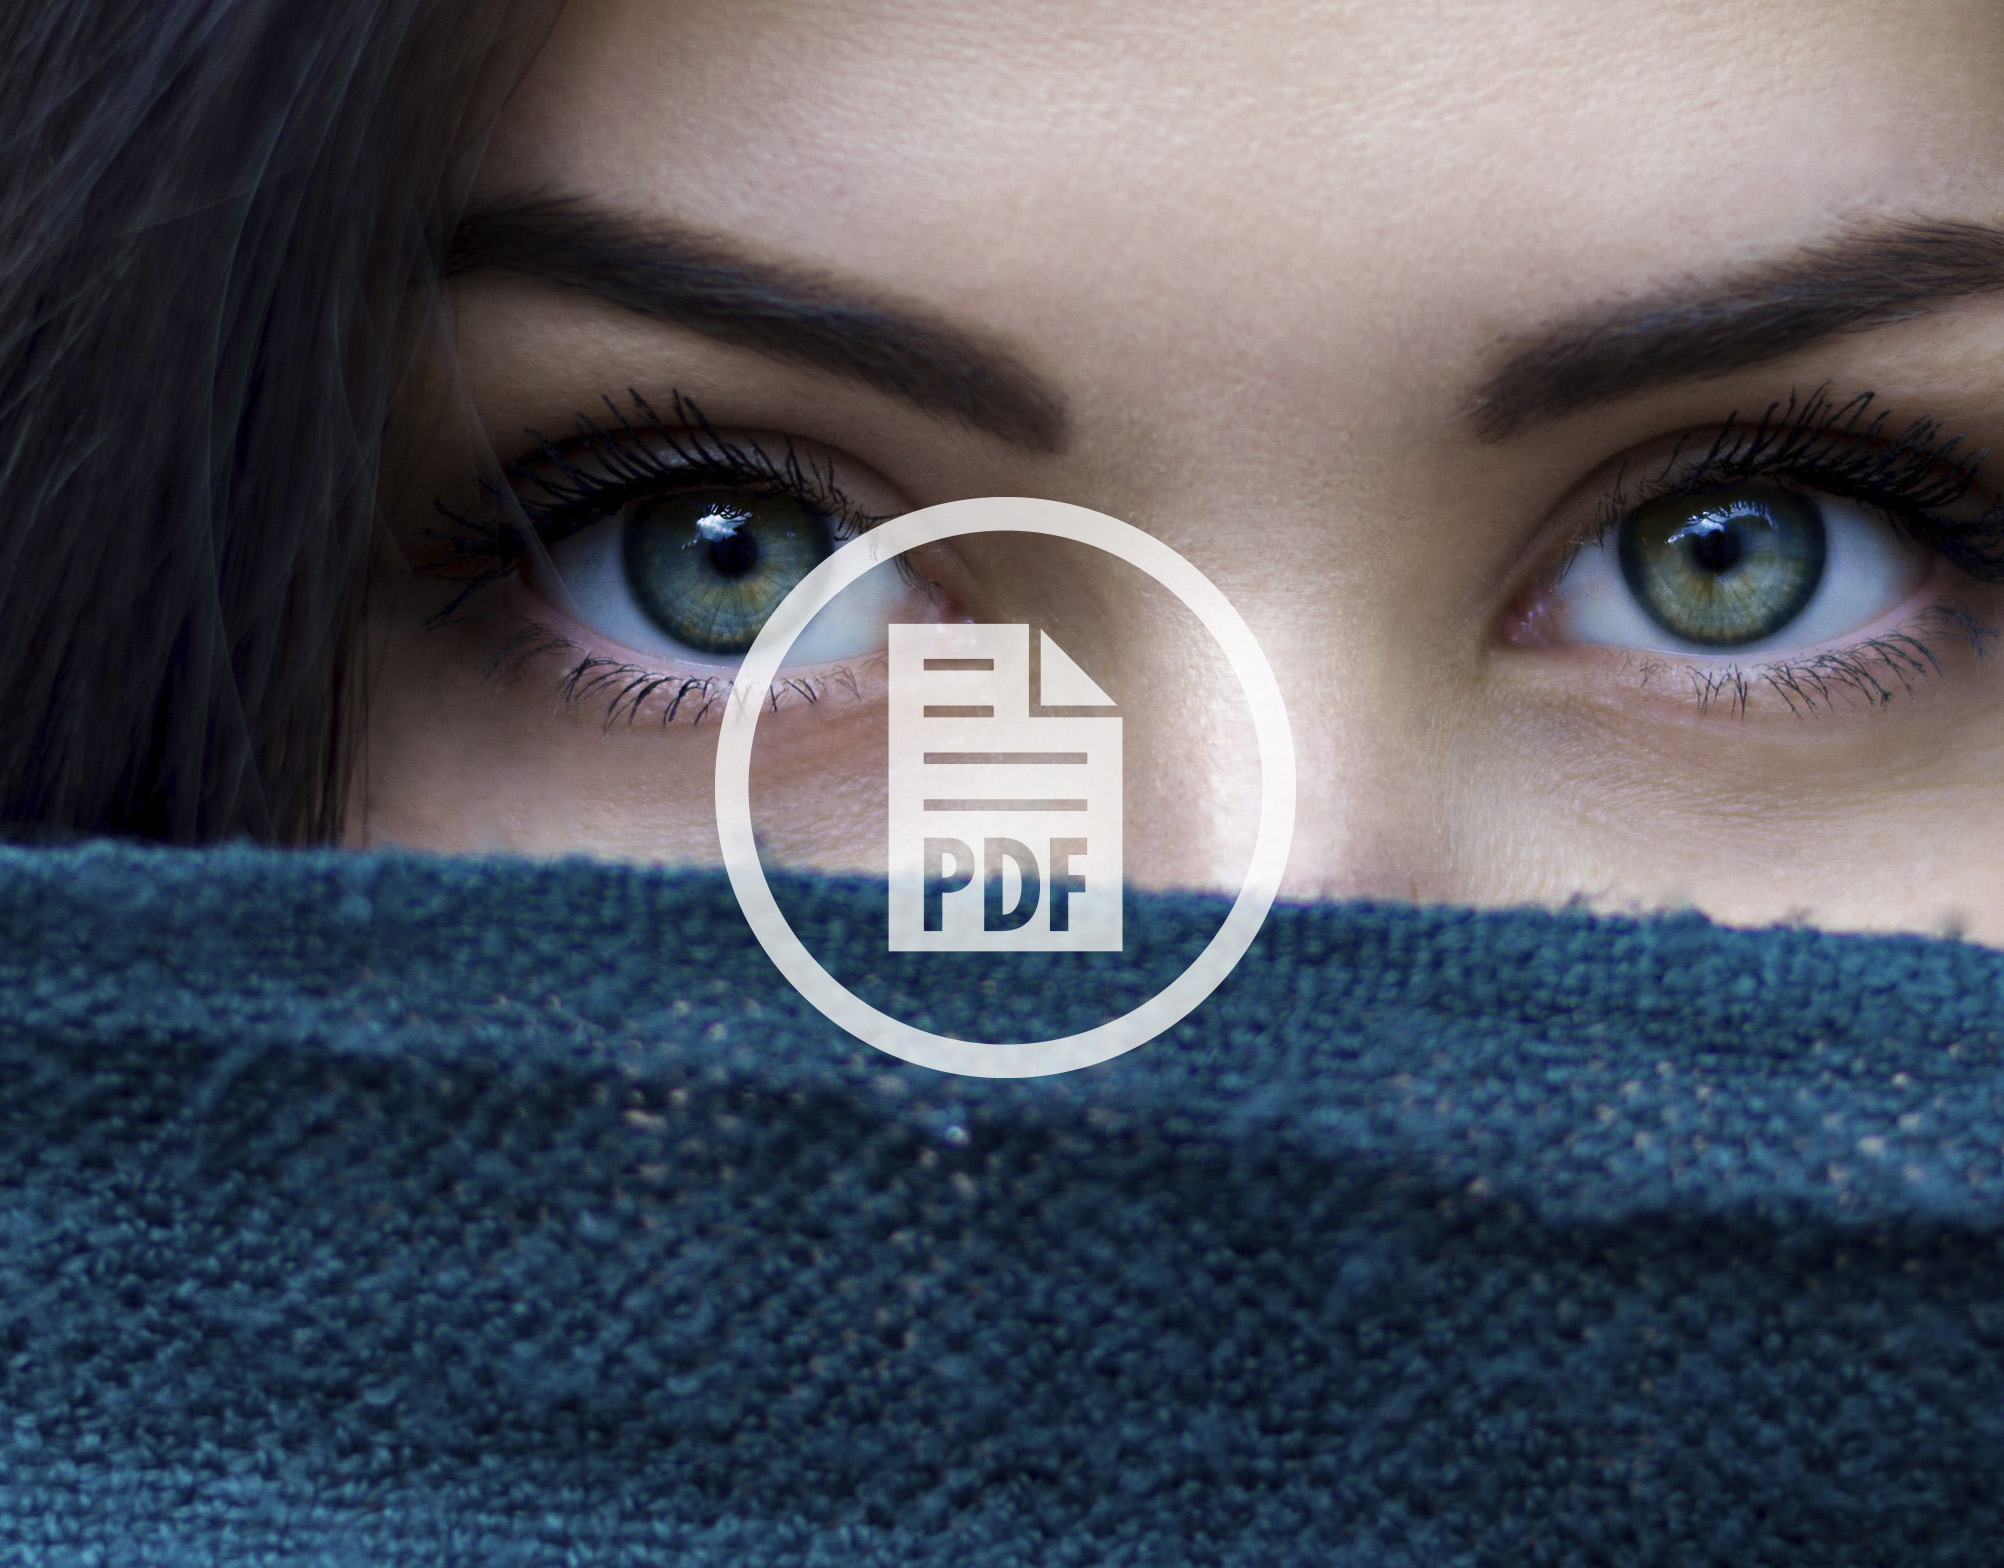 Flyer_Nachtlinsen_Ortho-K_pdf_preview